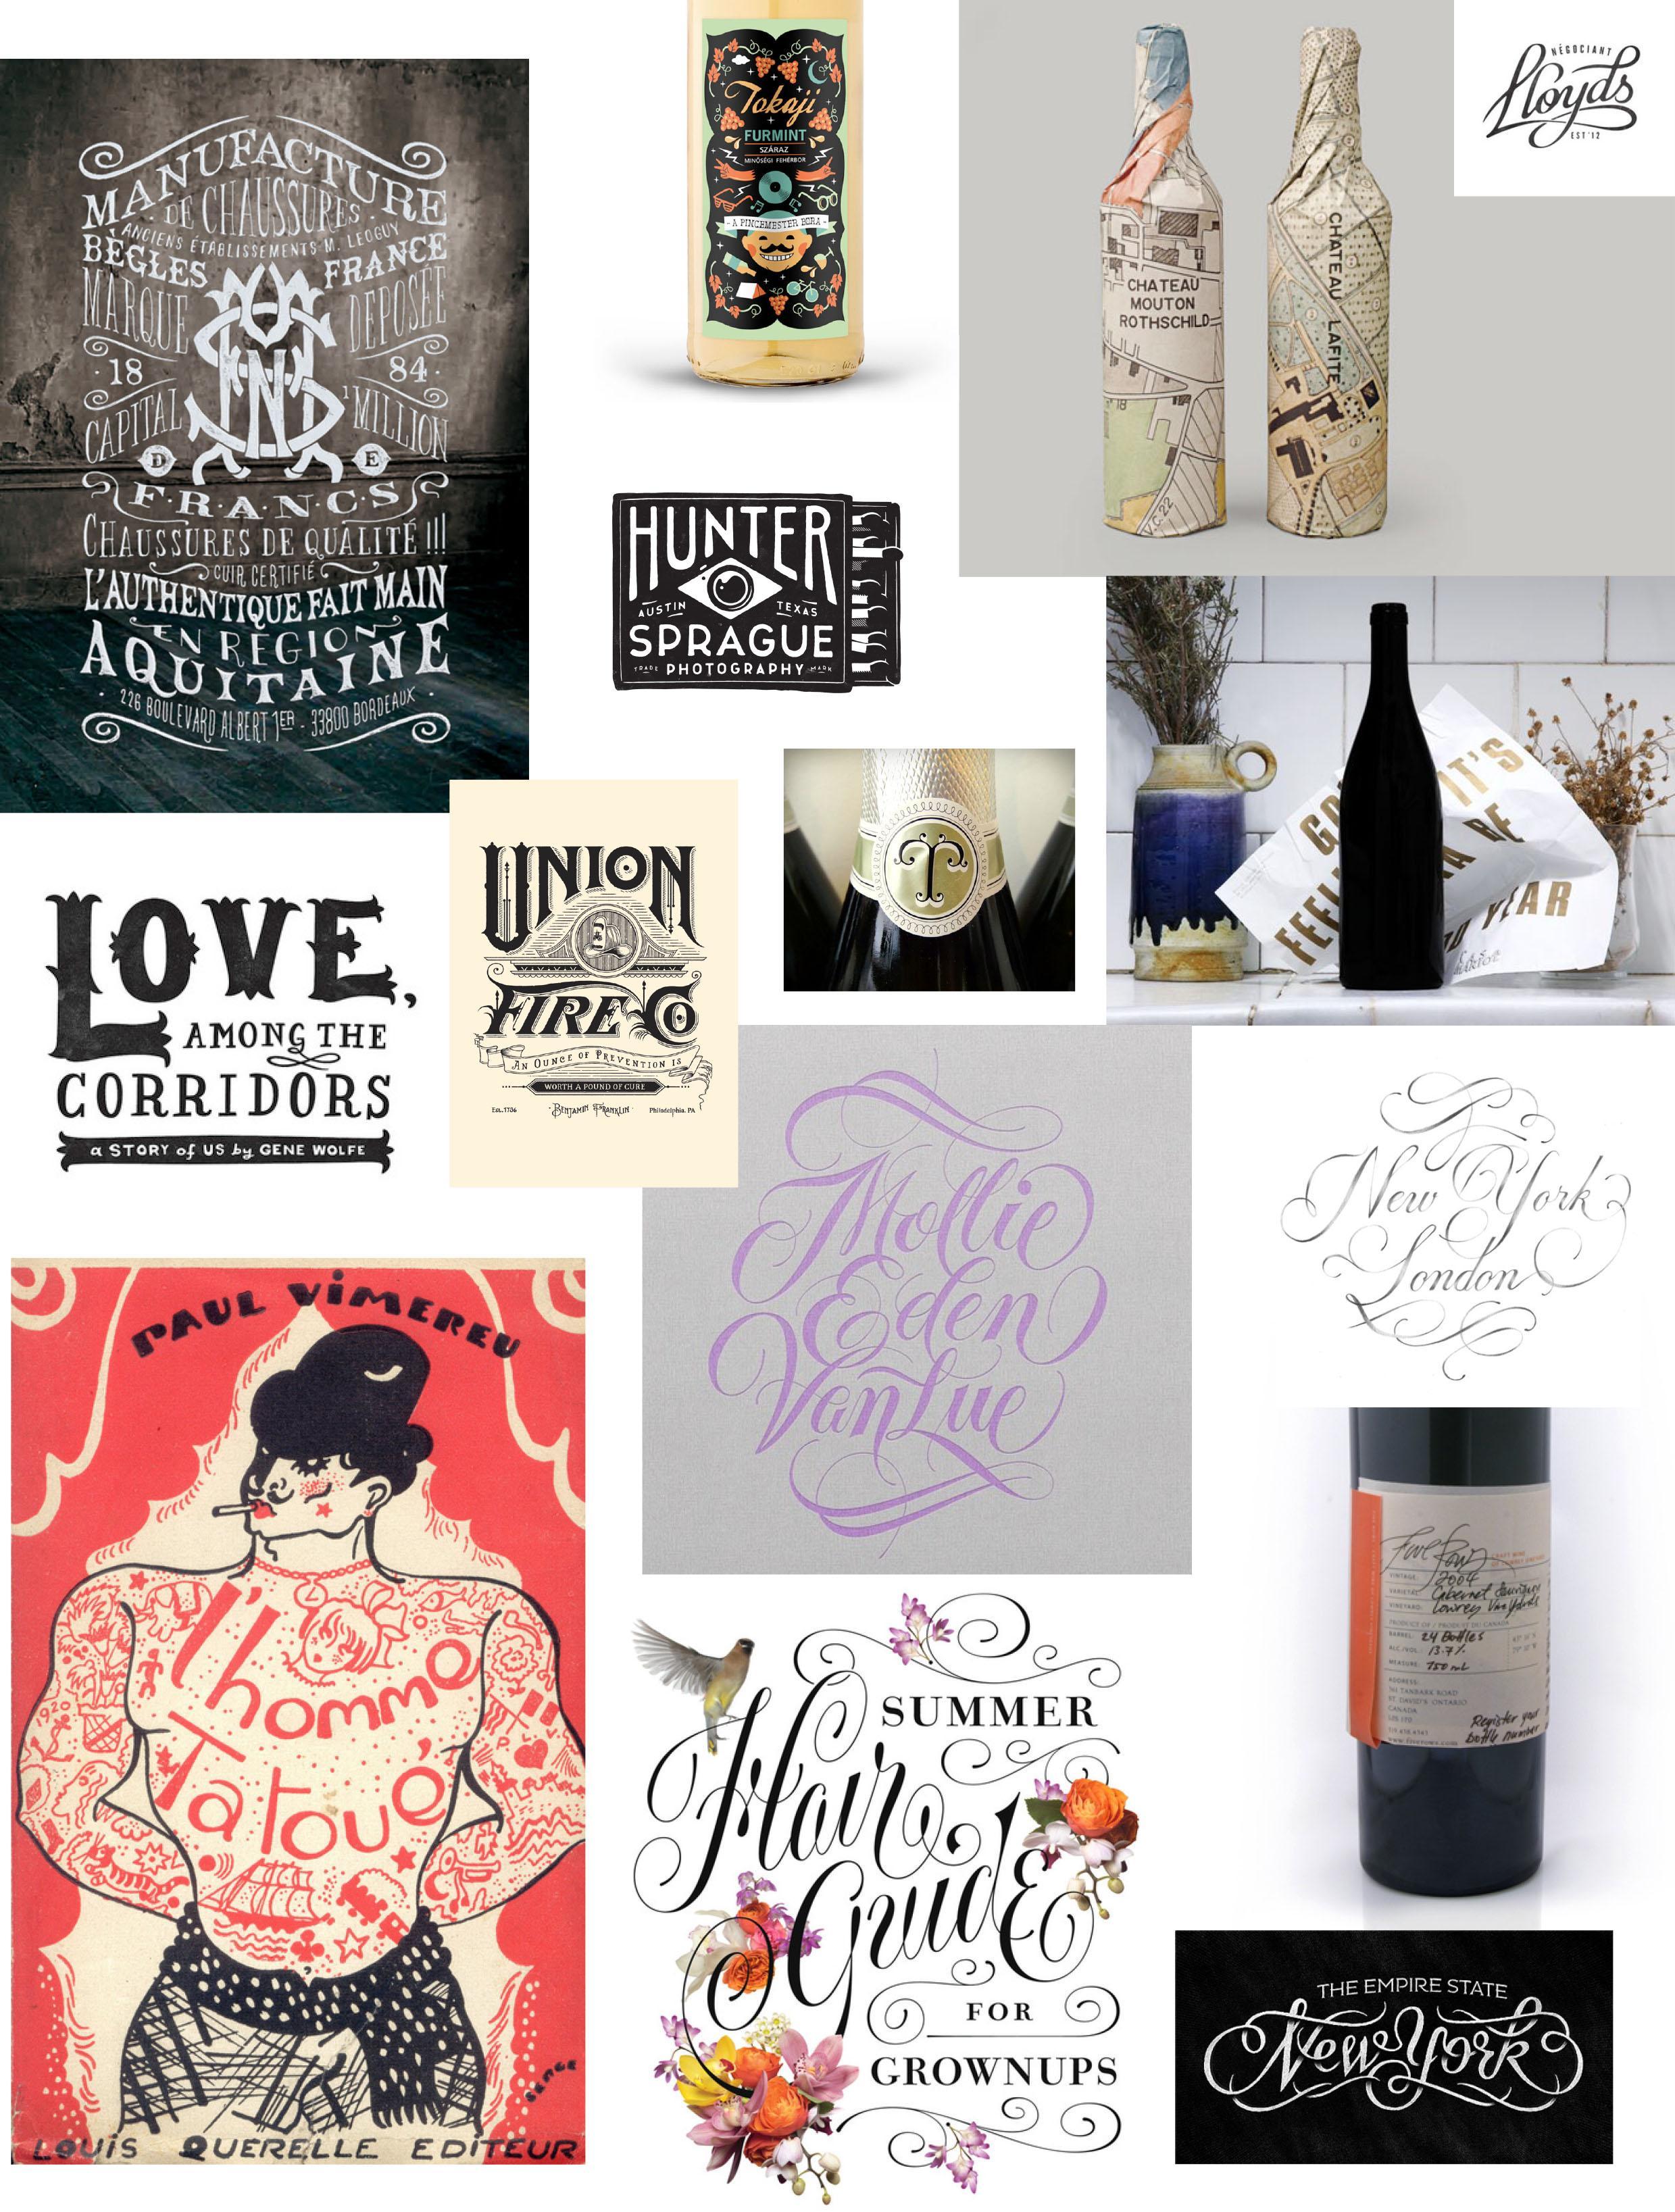 L + P Wedding Wine - image 1 - student project